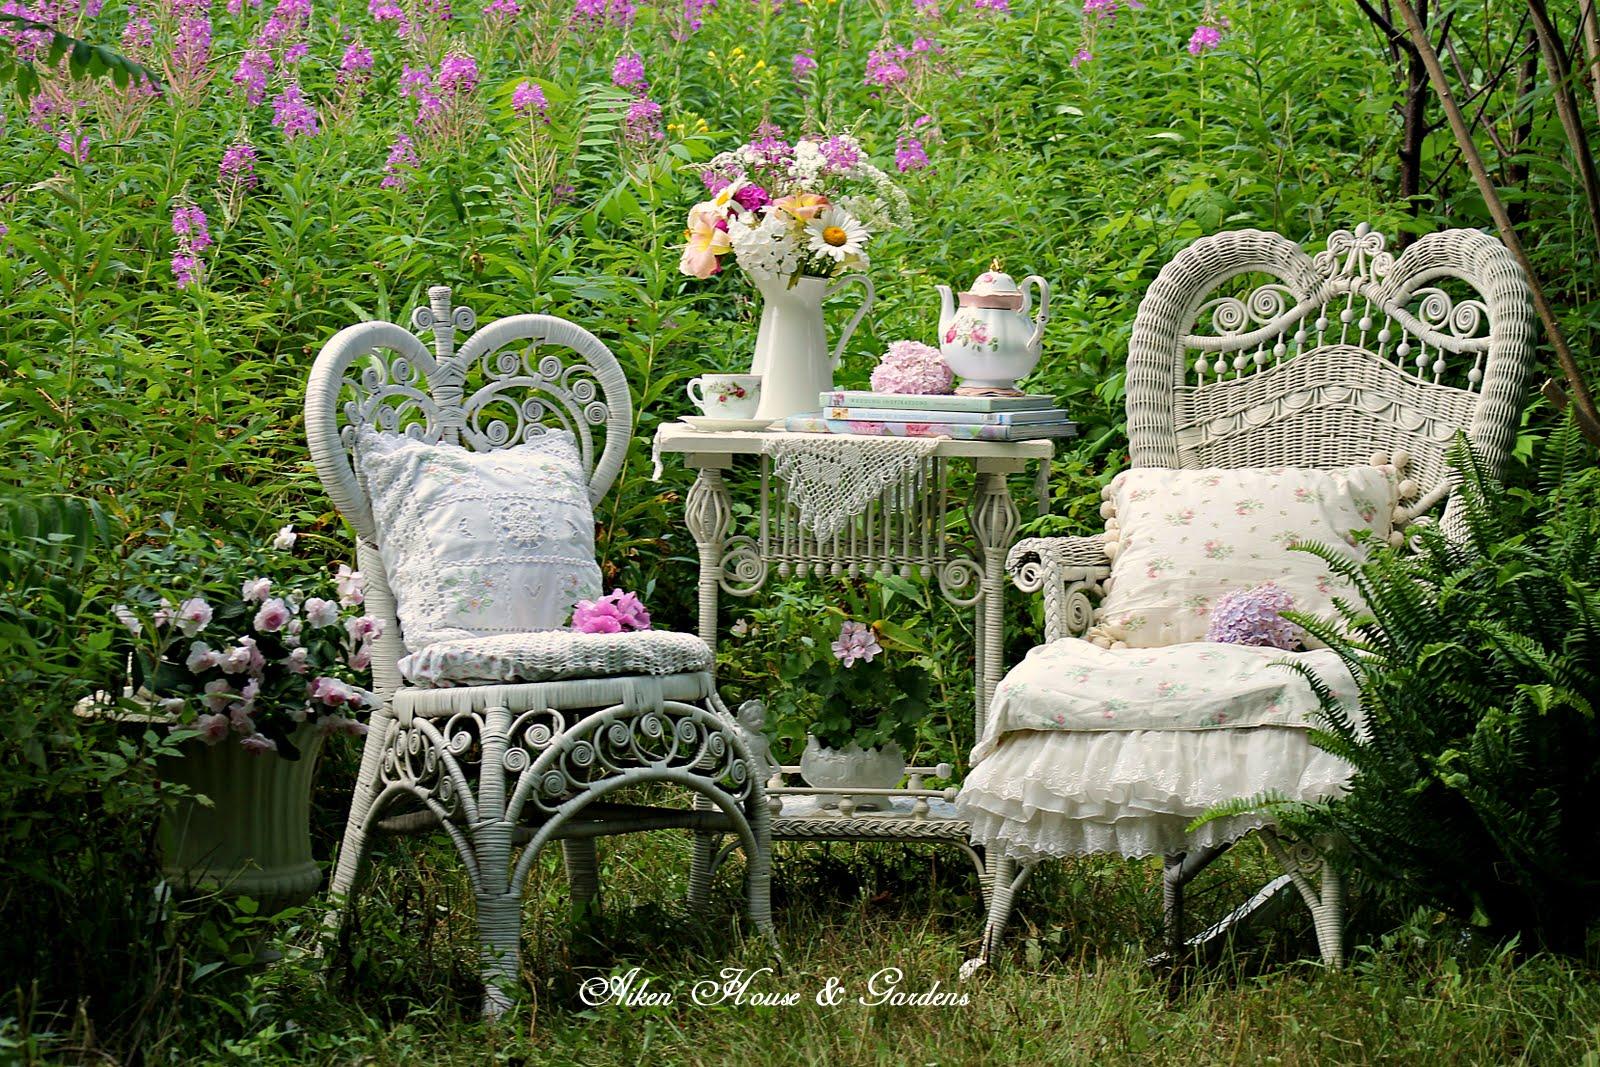 Aiken House & Gardens: Our Romantic Garden on Romantic Patio Ideas id=46655